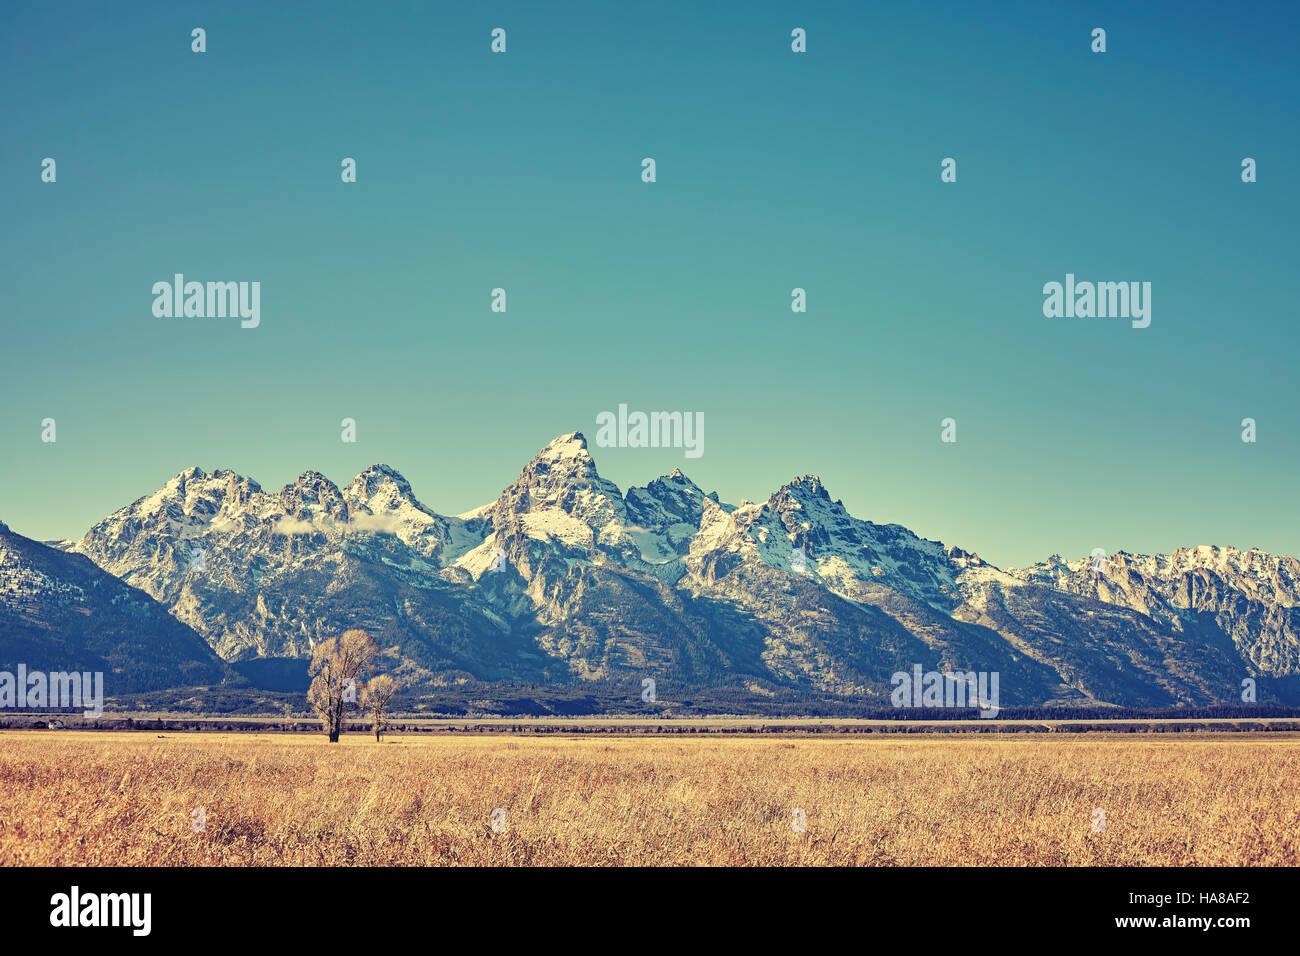 Vista de tonos retro cordillera Grand Teton, Wyoming, Estados Unidos. Imagen De Stock